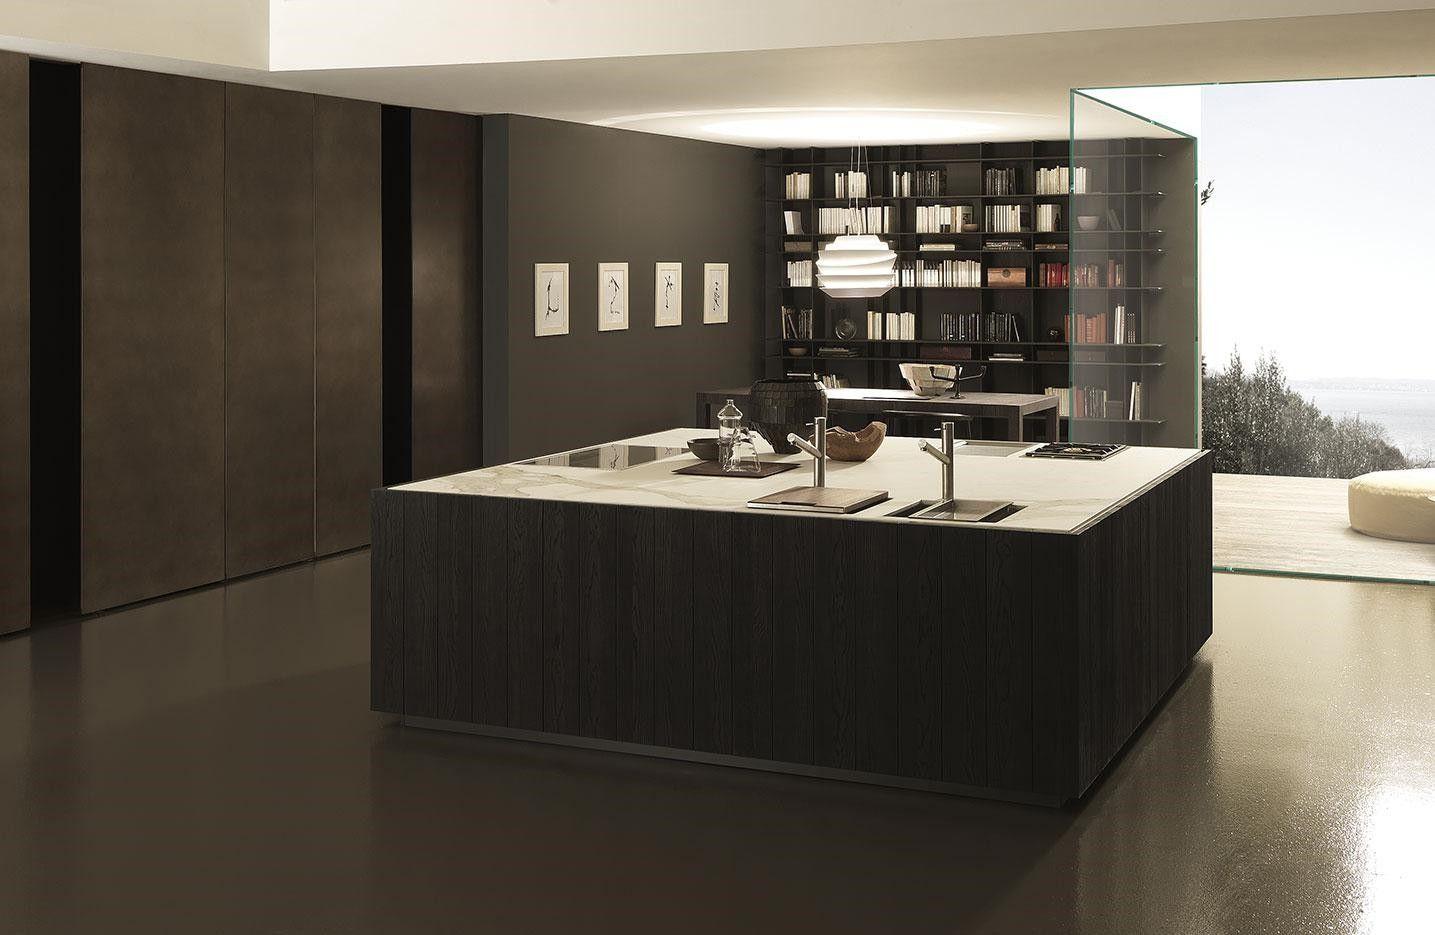 Cuisine Design Et Haut De Gamme A Montpellier Porto Venere Cuisines Design Cuisine Moderne Cuisine Contemporaine